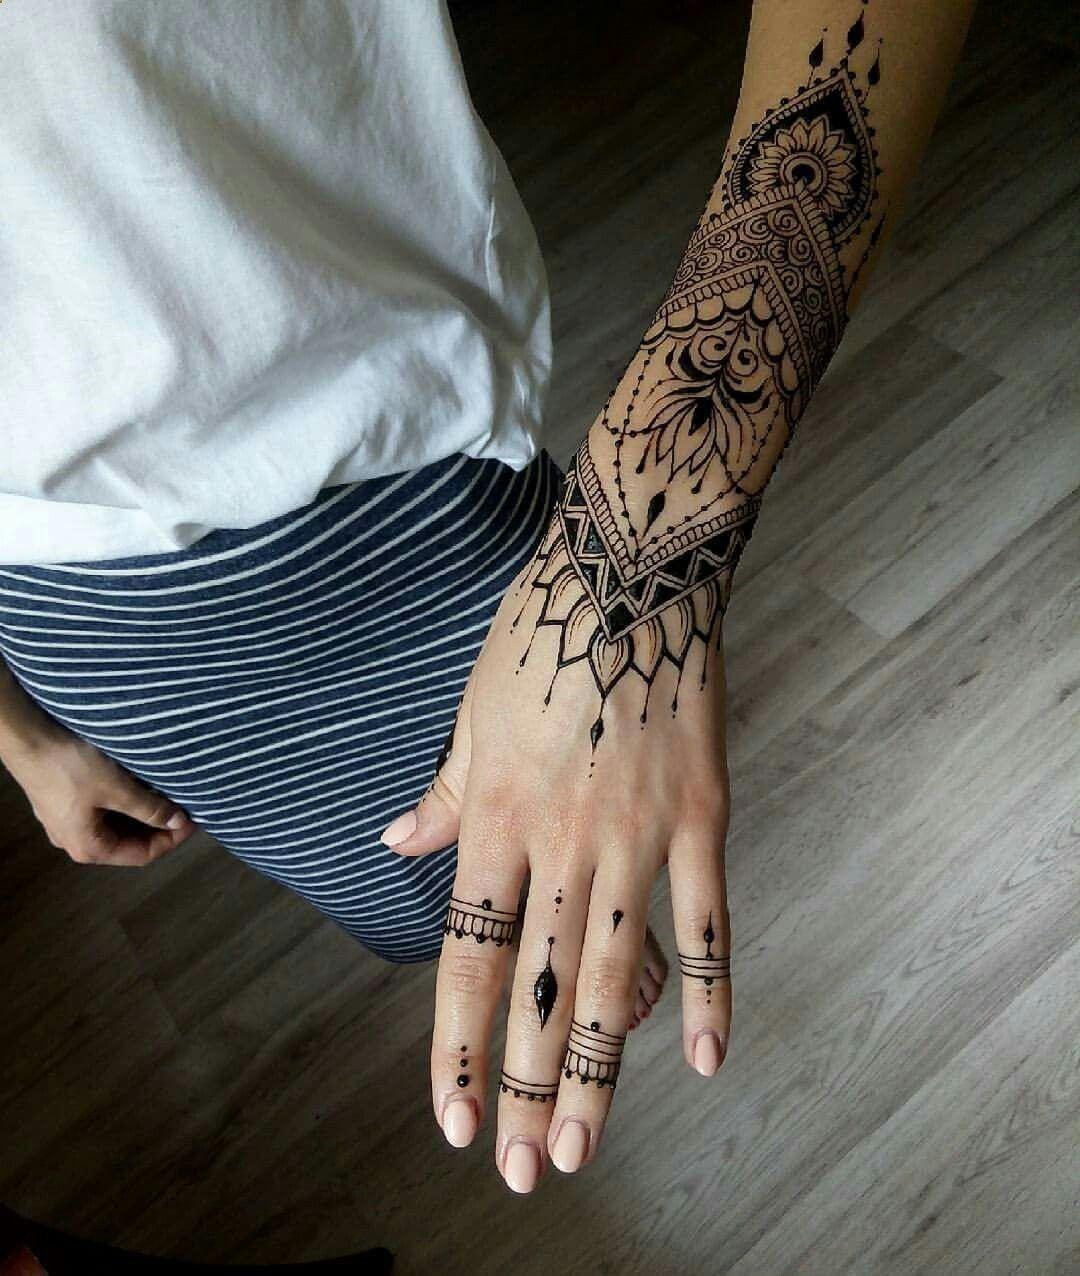 Henna Tattoo Hand Amazon: Henna Inspired Tattoos, Henna